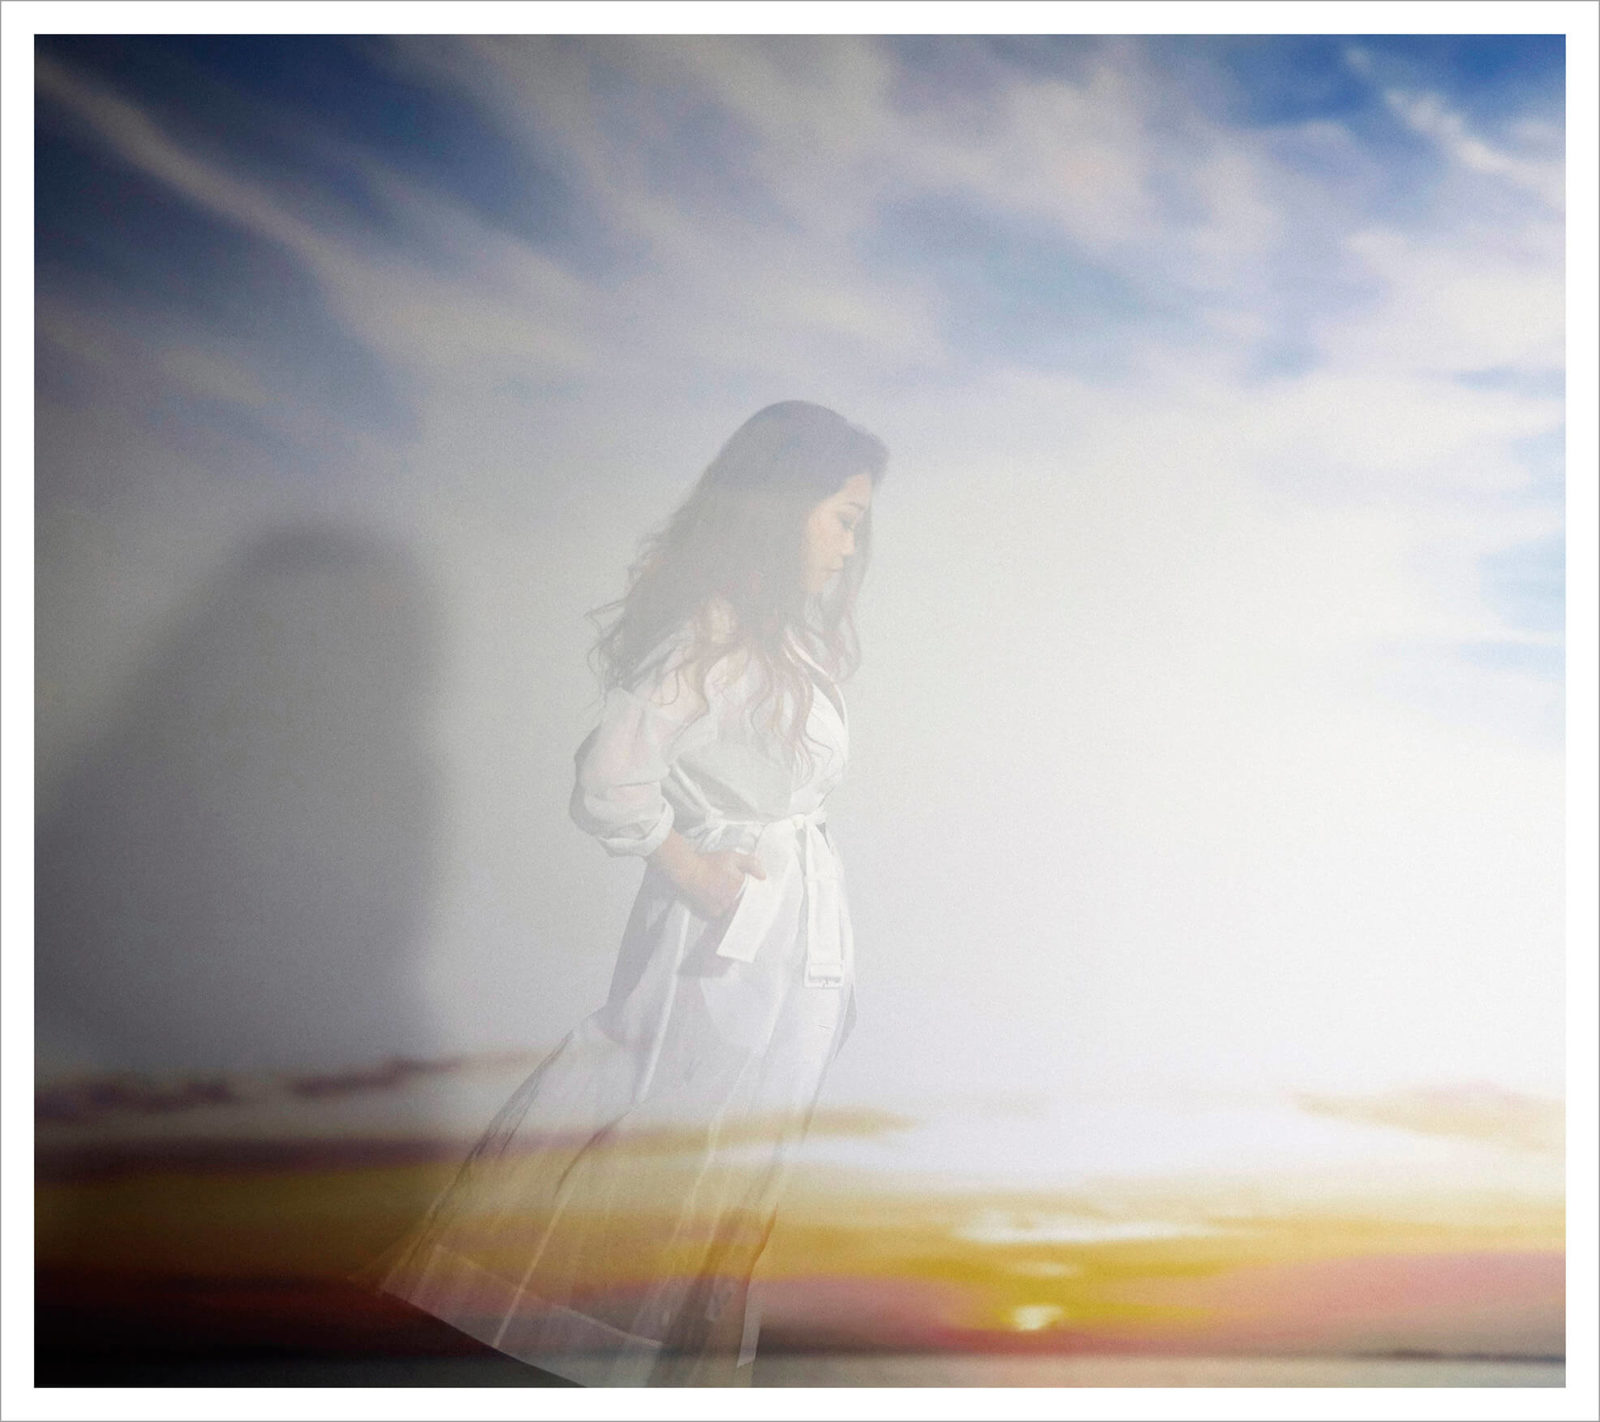 JUJU、新曲「ミライ」MVが期間限定でフル公開サムネイル画像